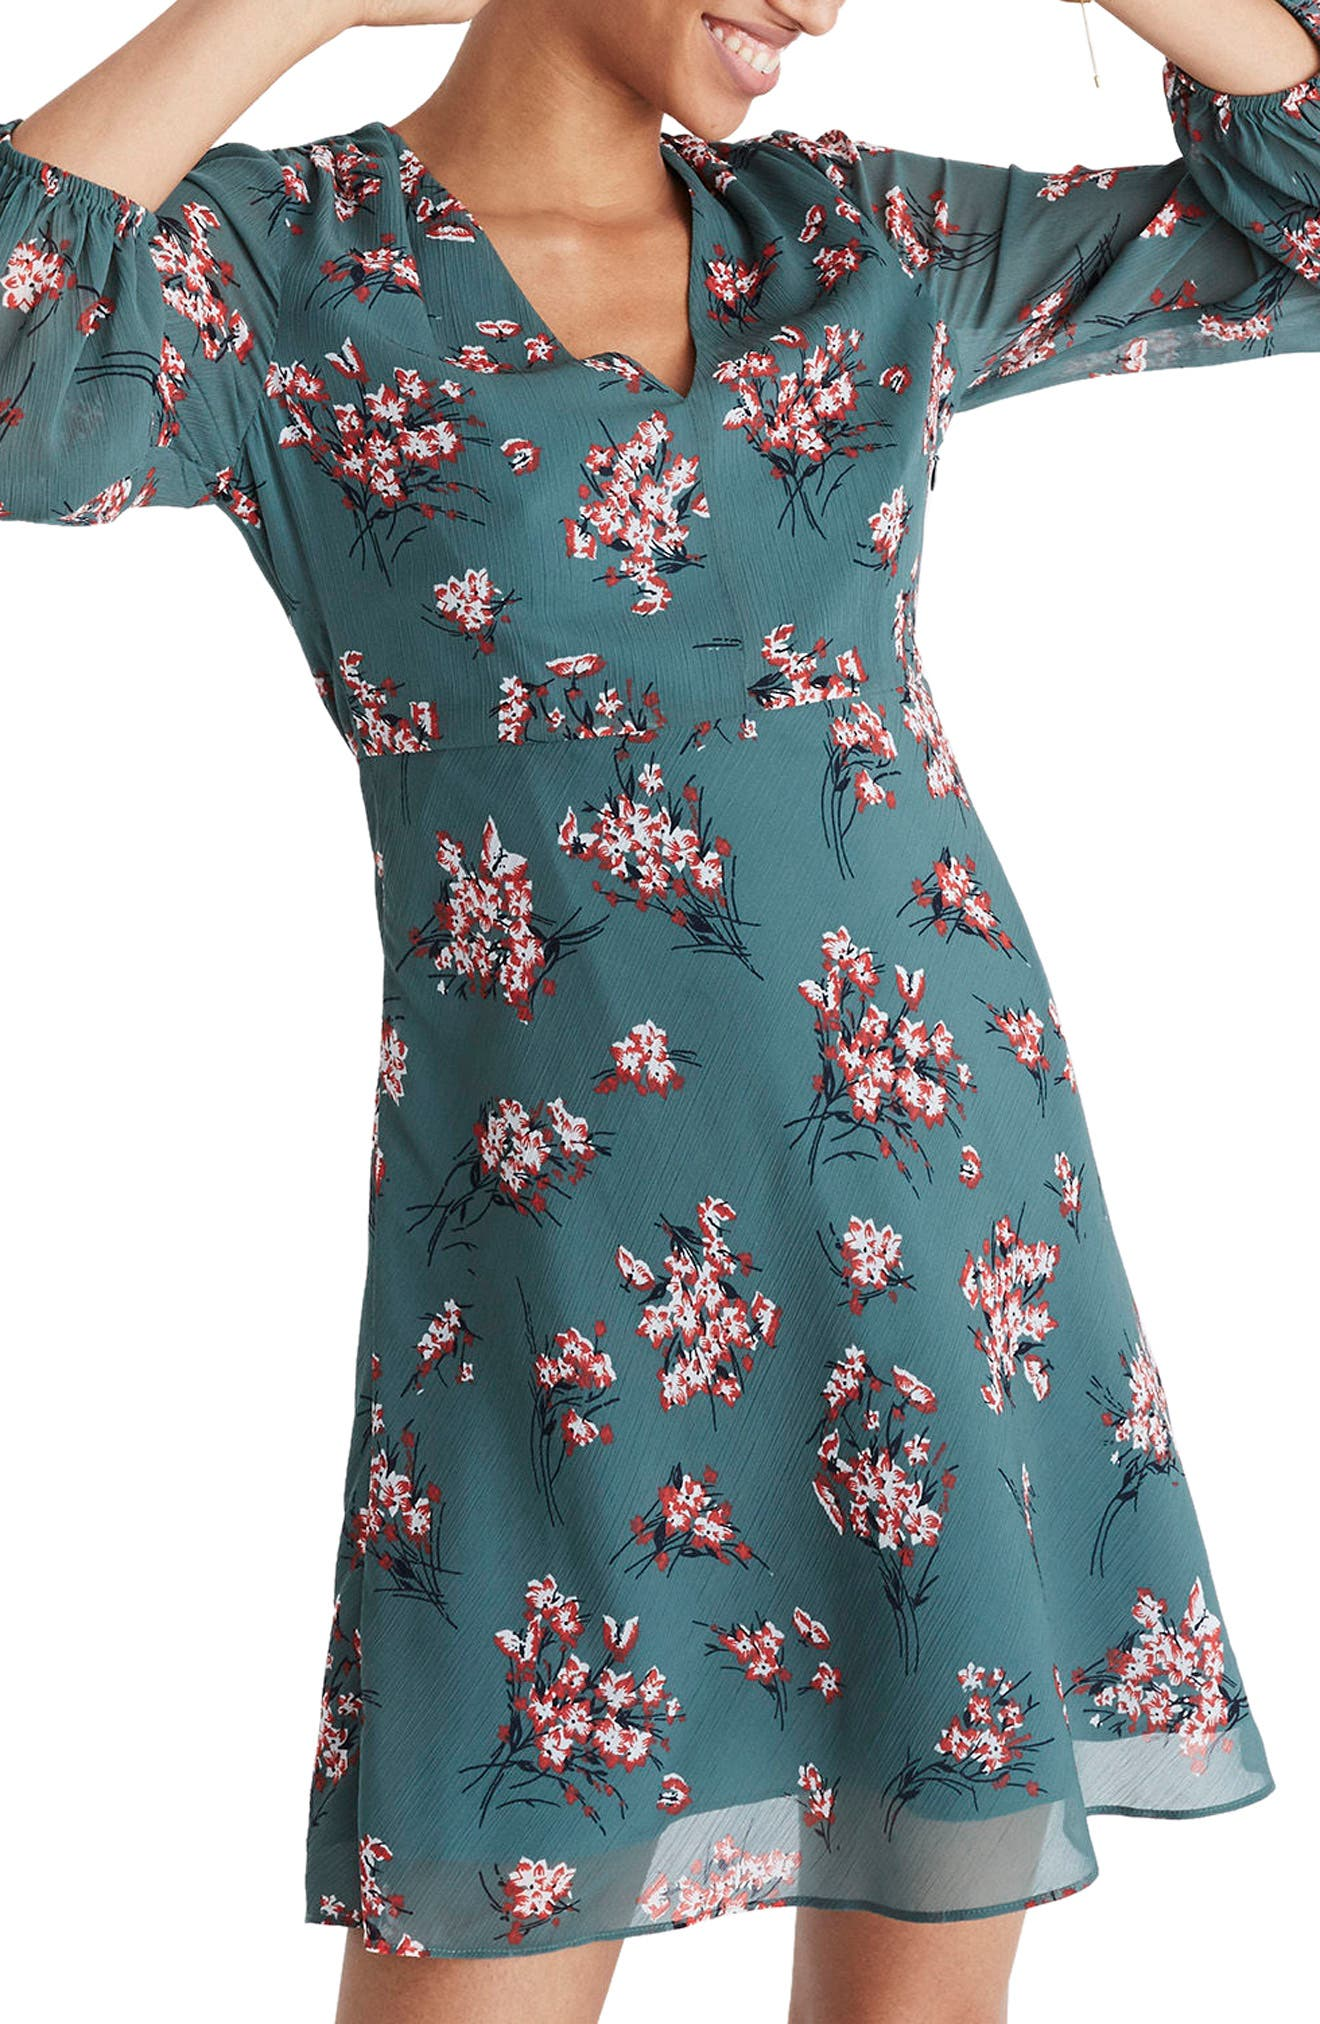 Marguerite Swing Dress,                         Main,                         color, Butterfly Meadow Green